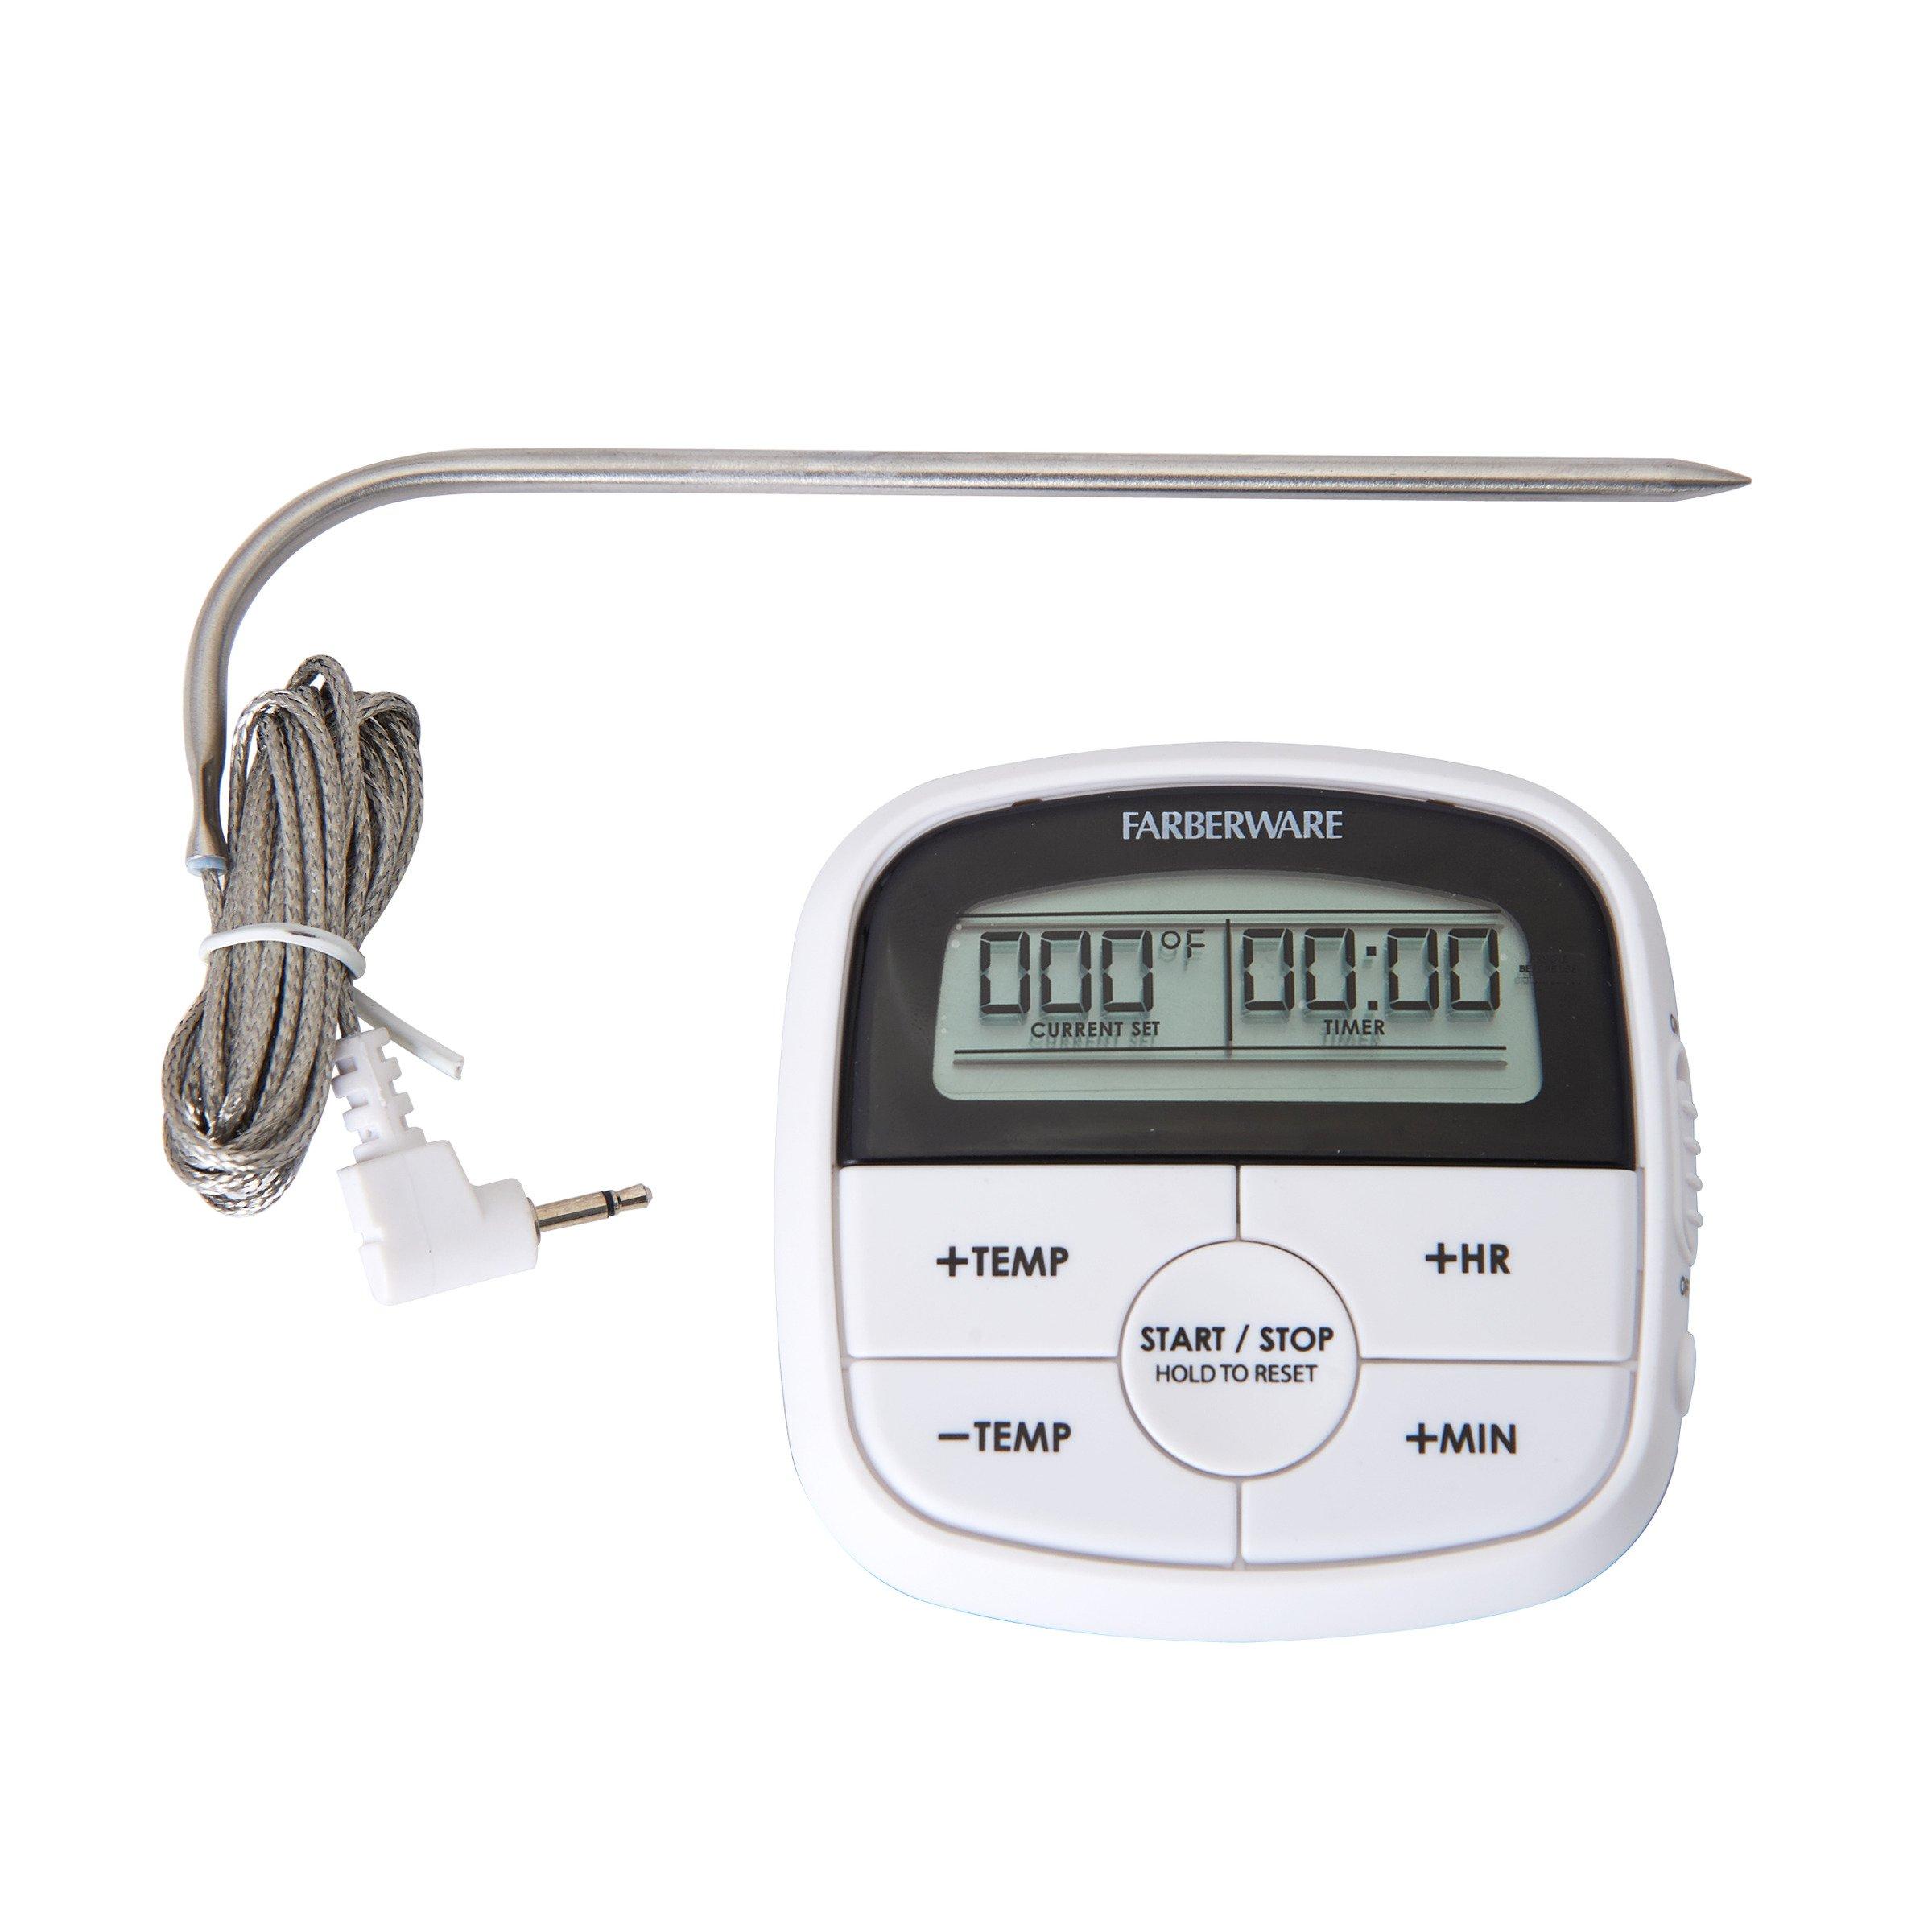 Farberware 5215931 Roast Oven Thermometer, One Size, Black